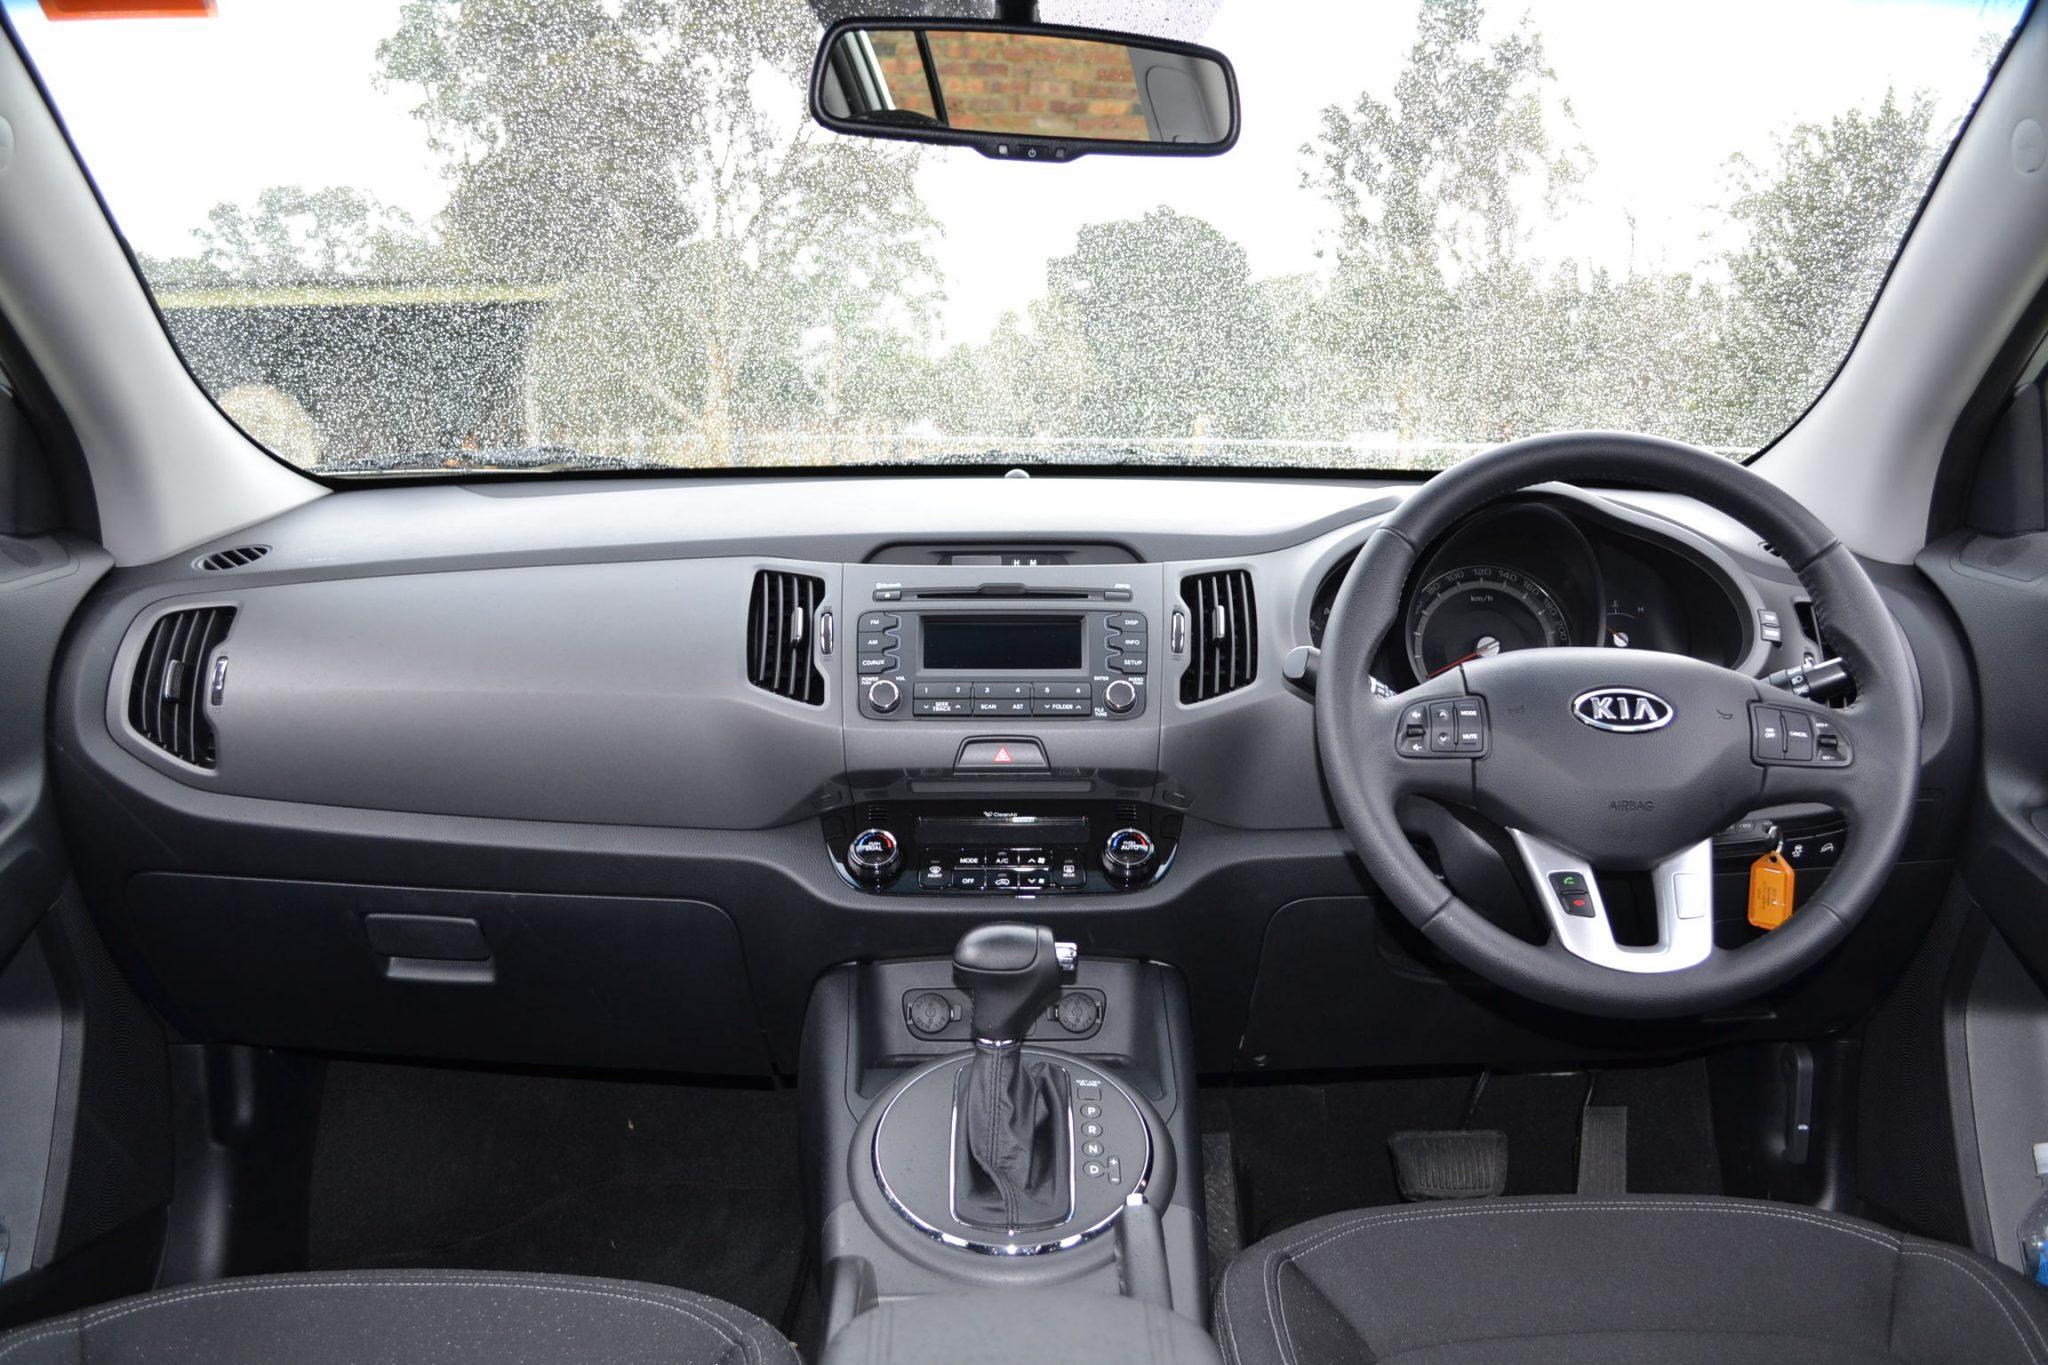 Kia Sportage Review   2012 SLi Diesel Automatic, Interior Shot